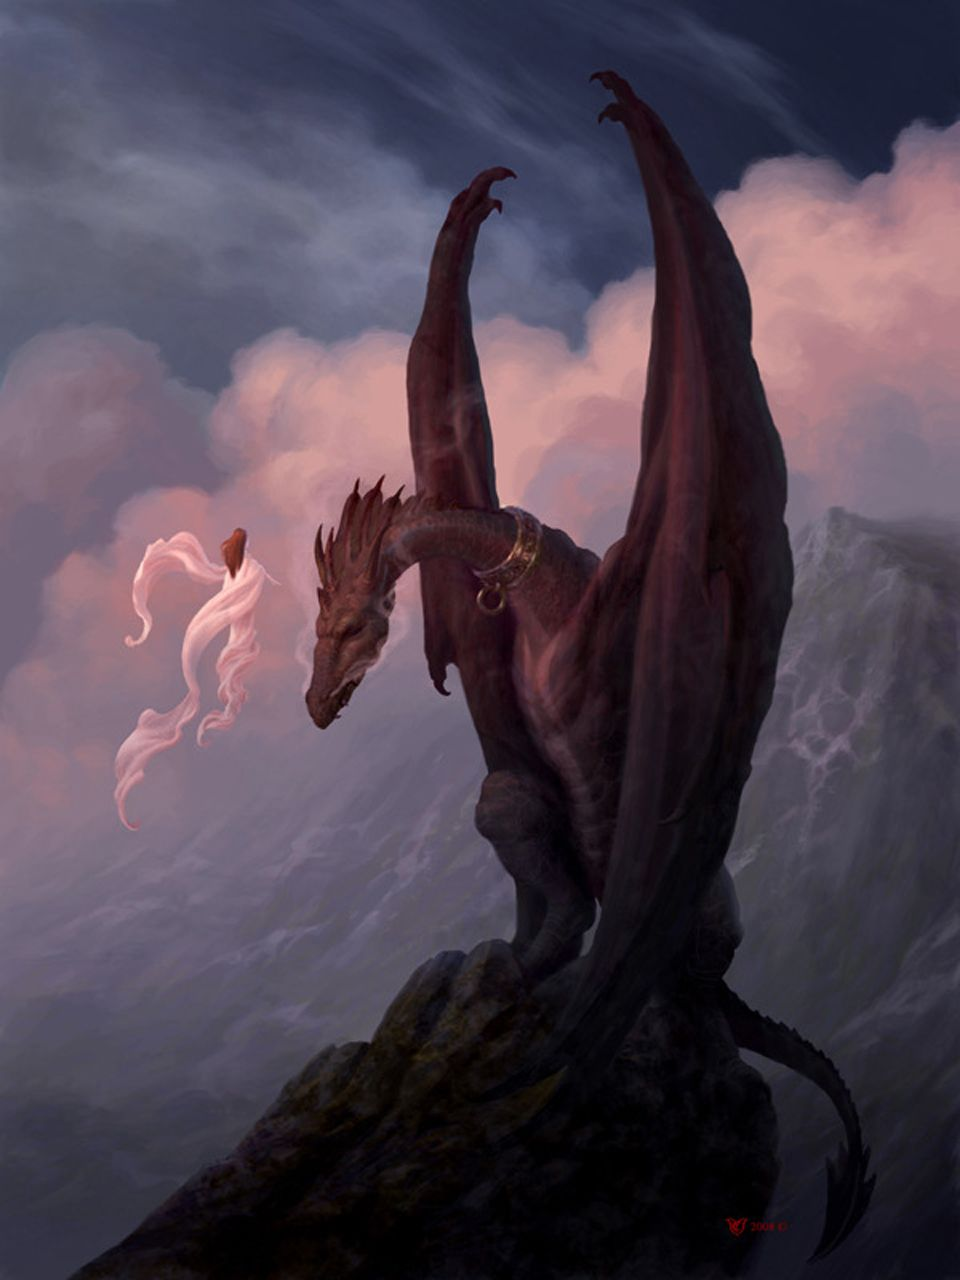 Christophe Vacher | Dogs & Dragons | Pinterest | Dragons ...